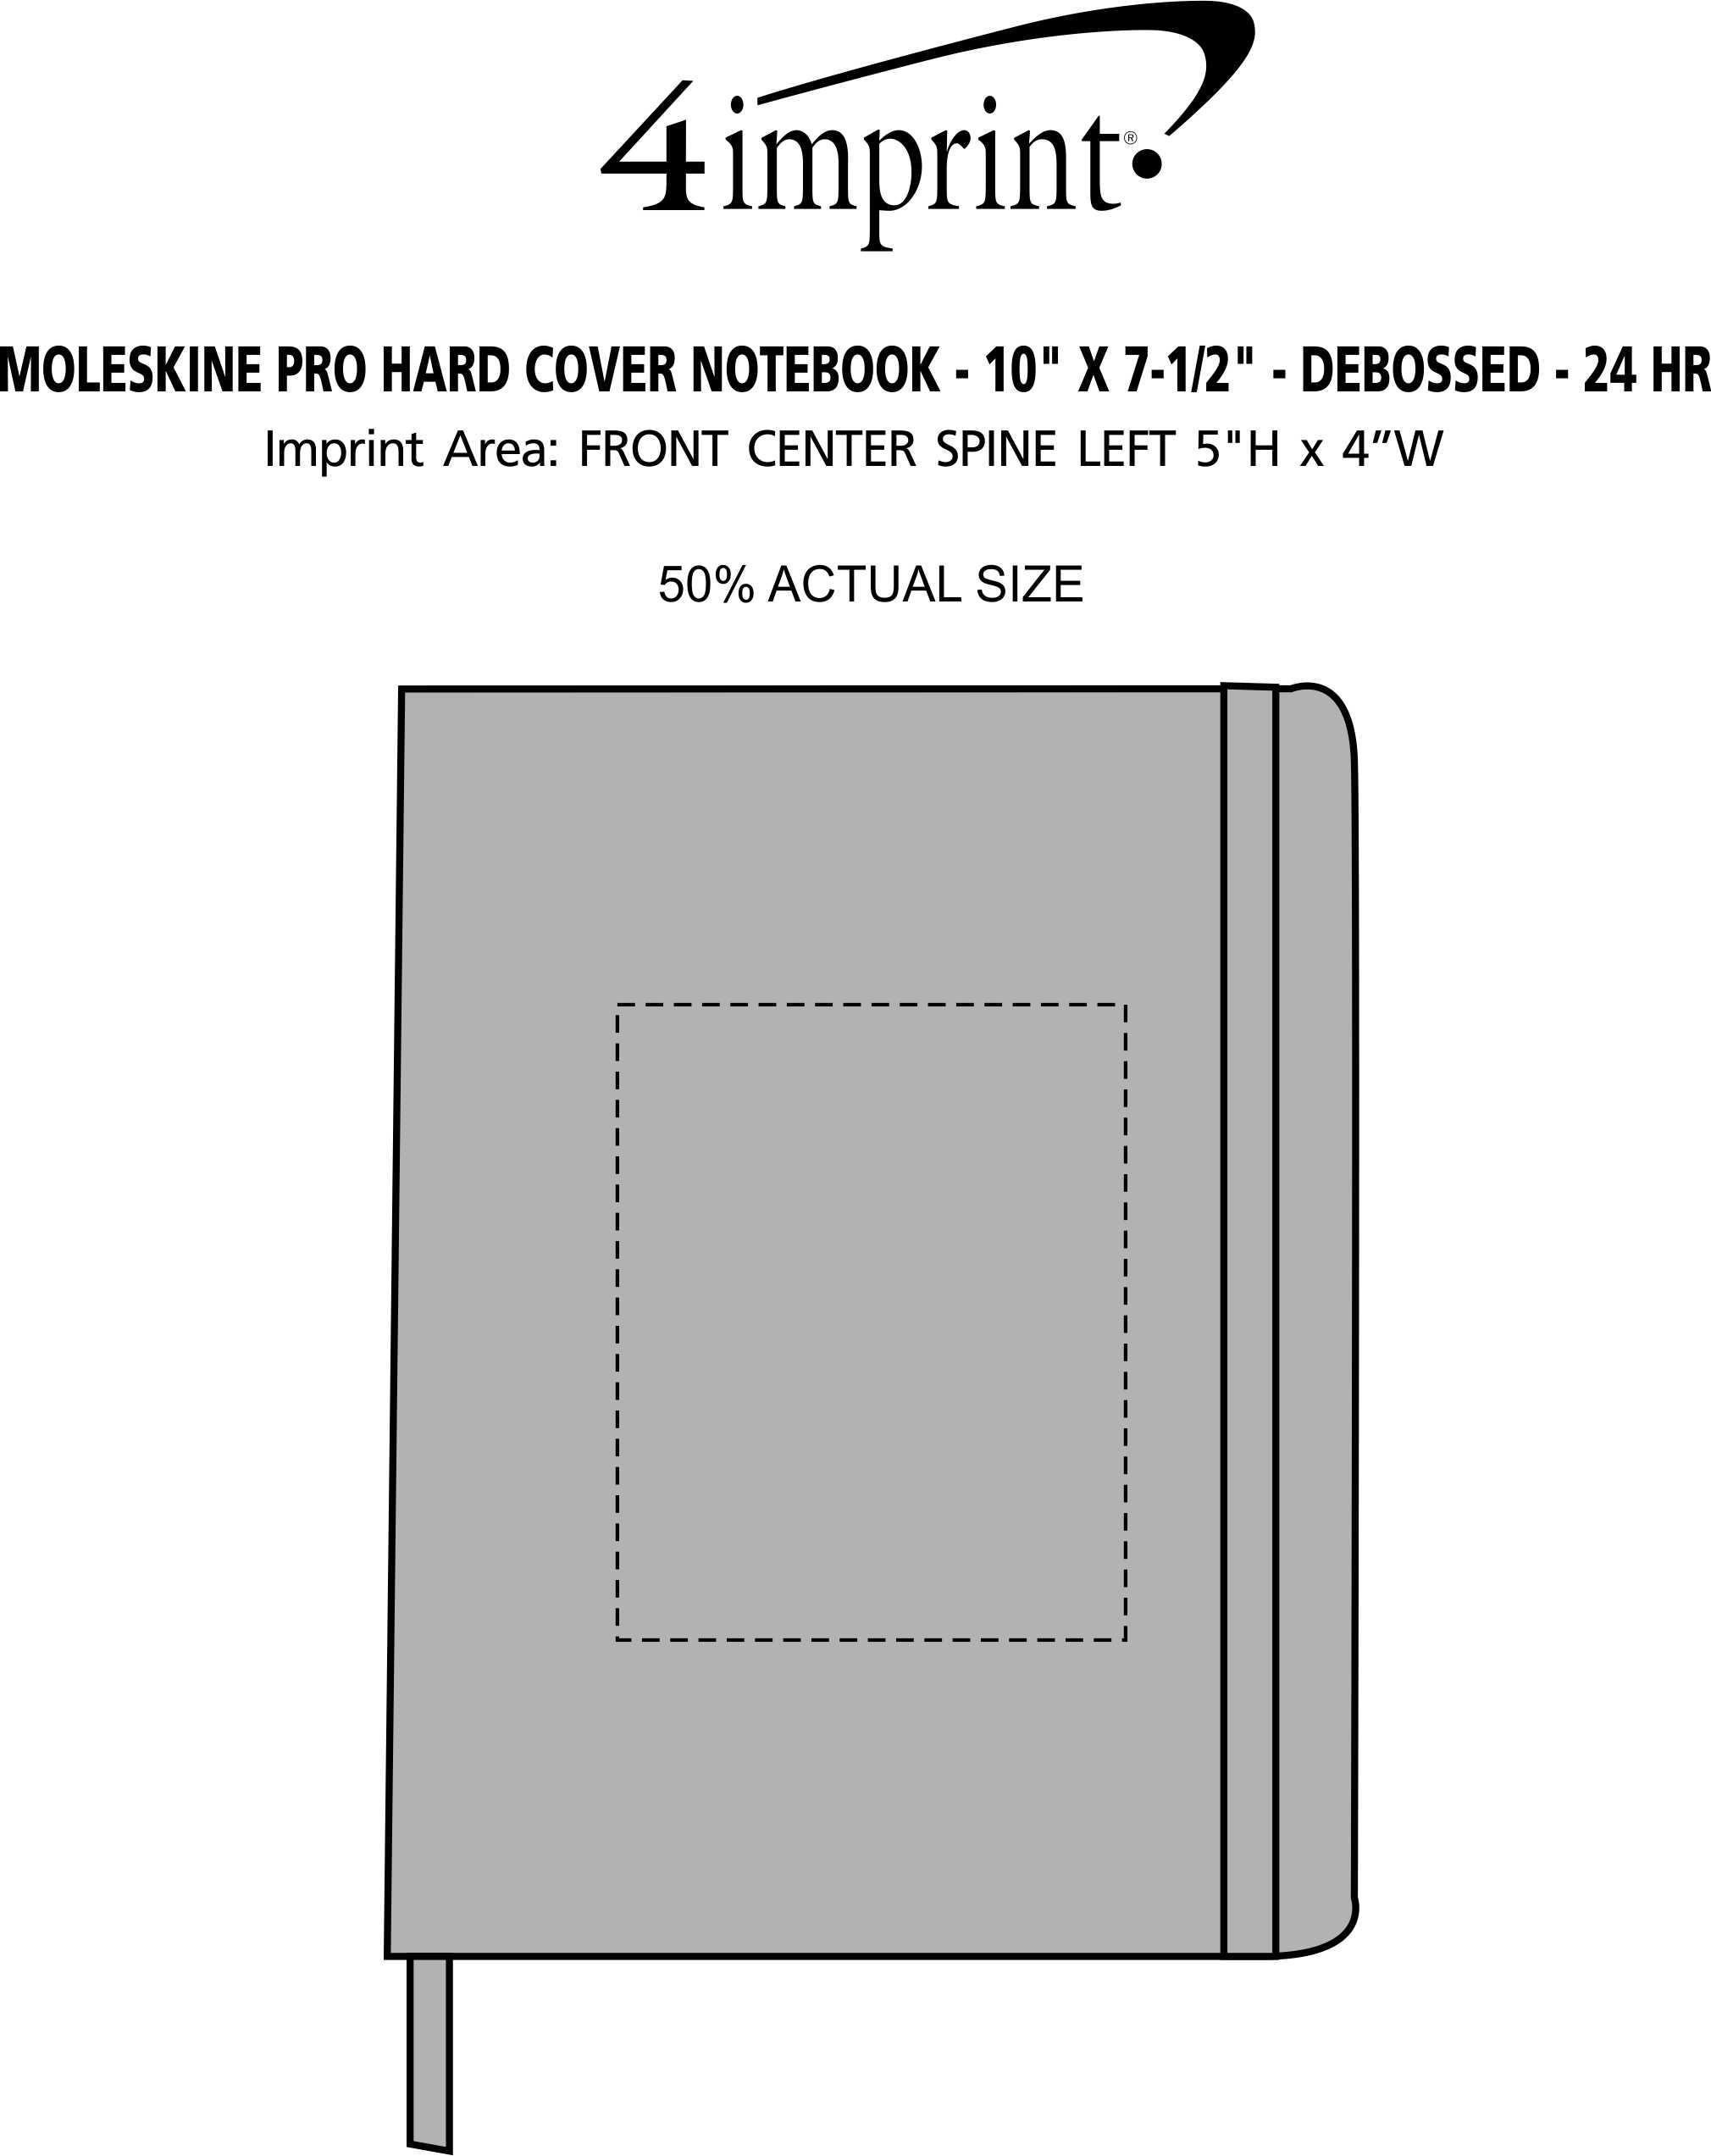 "Imprint Area of Moleskine Pro Hard Cover Notebook - 10"" x 7-1/2"" - Debossed - 24 hr"